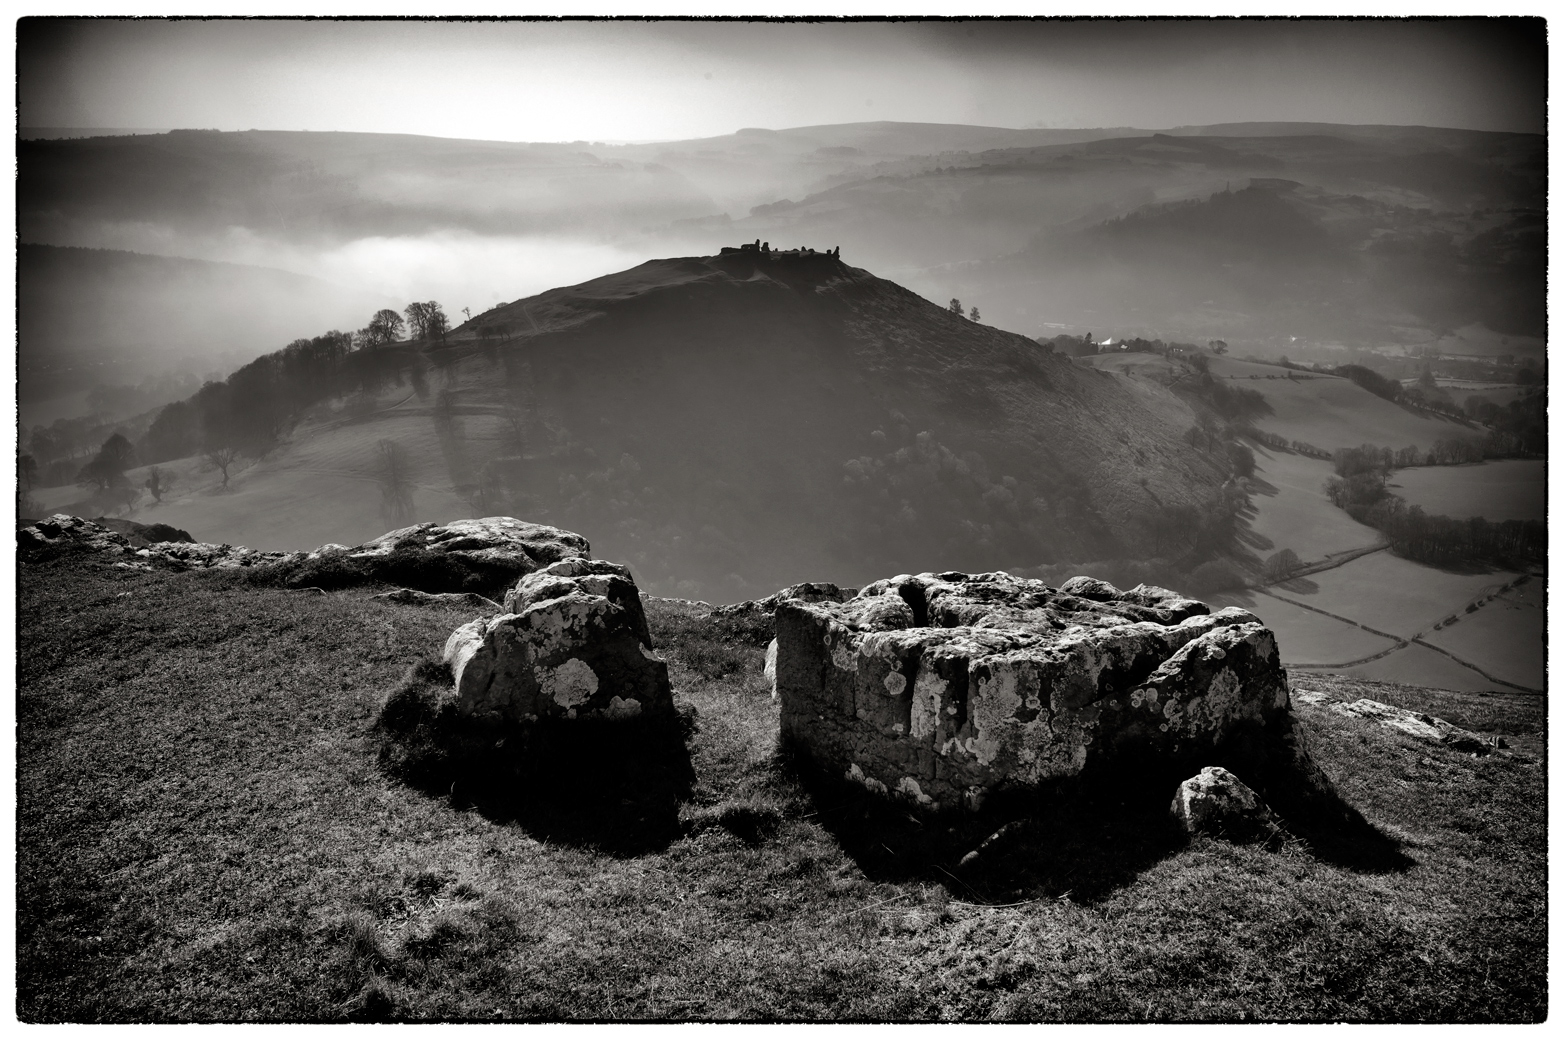 Dinas Bran silhouetted through the mist.